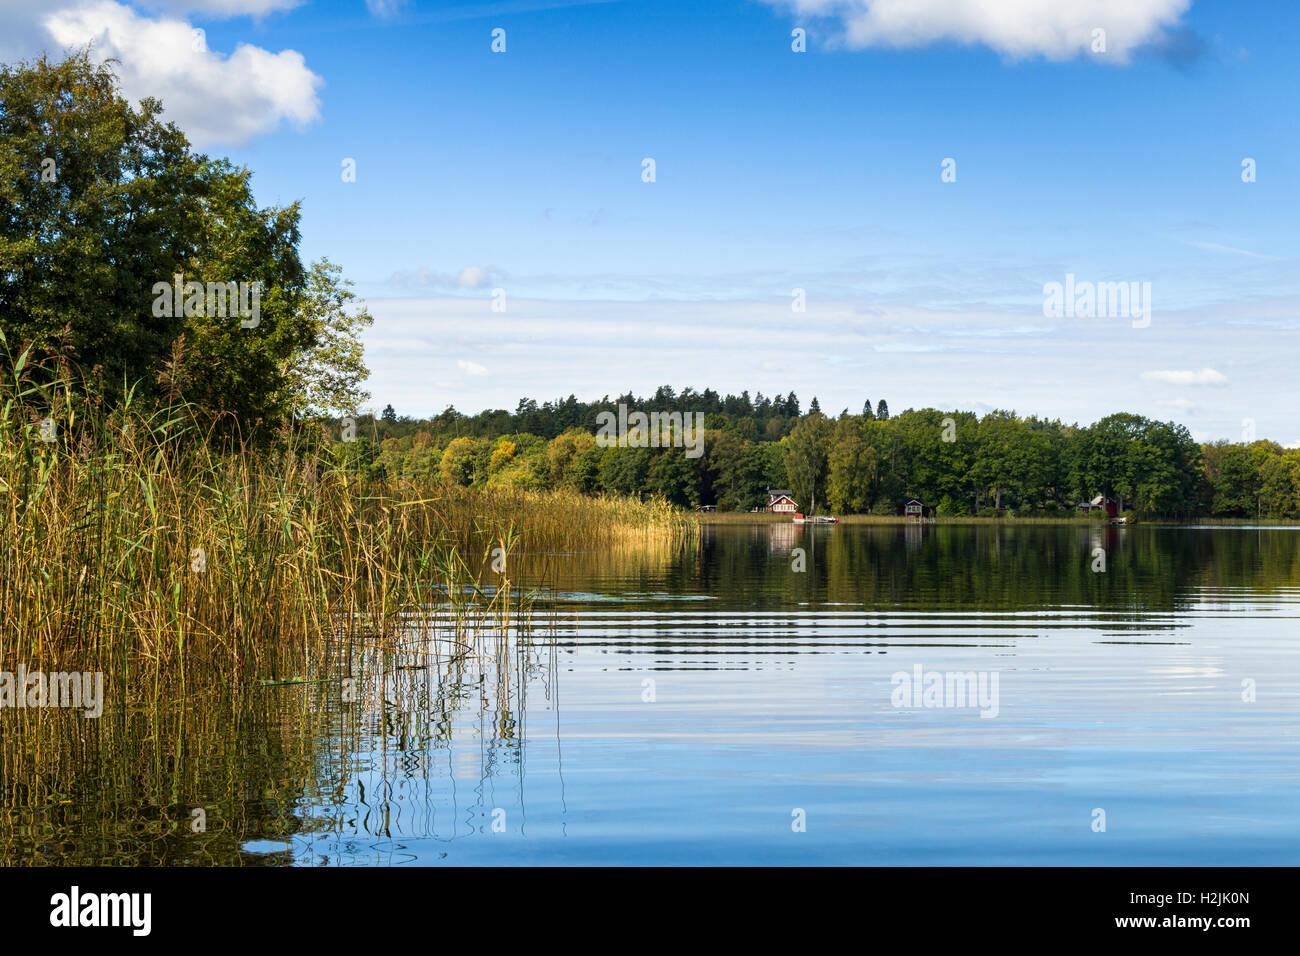 Lake Sävelången landscape waterscape picturesque scenery scenic close to Nääs Castle in Floda, - Stock Image